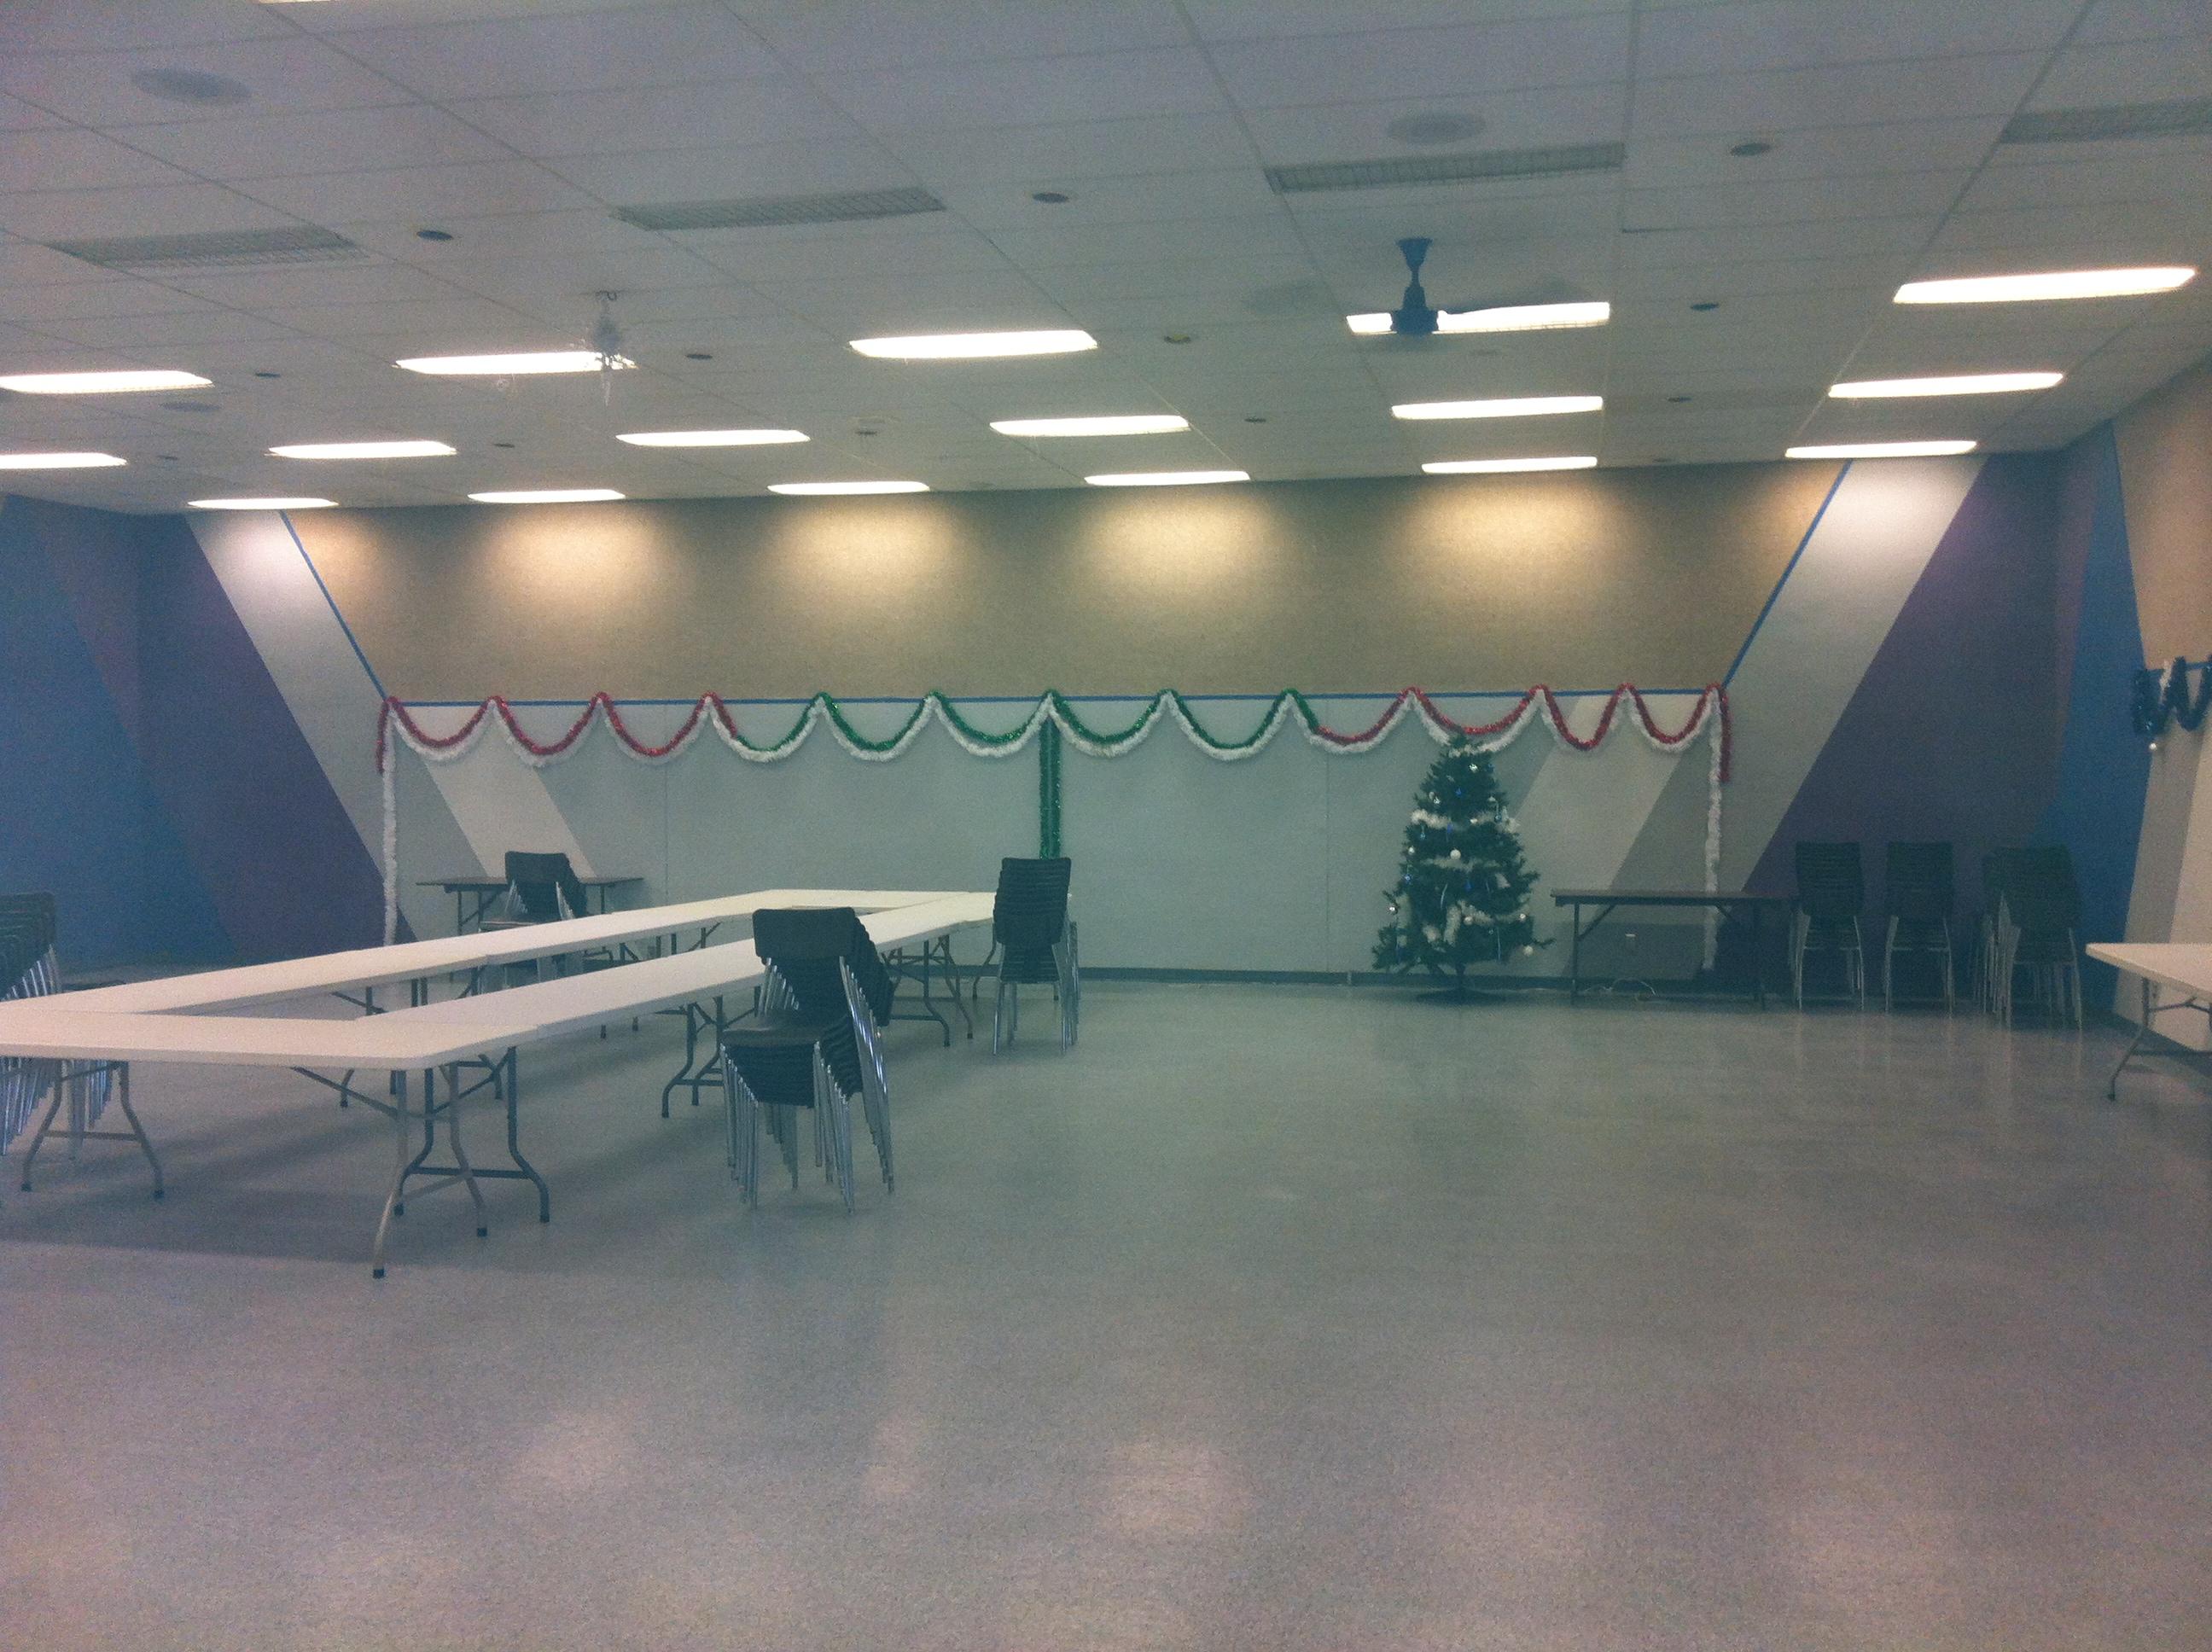 CP Hall Dec 19 11.JPG